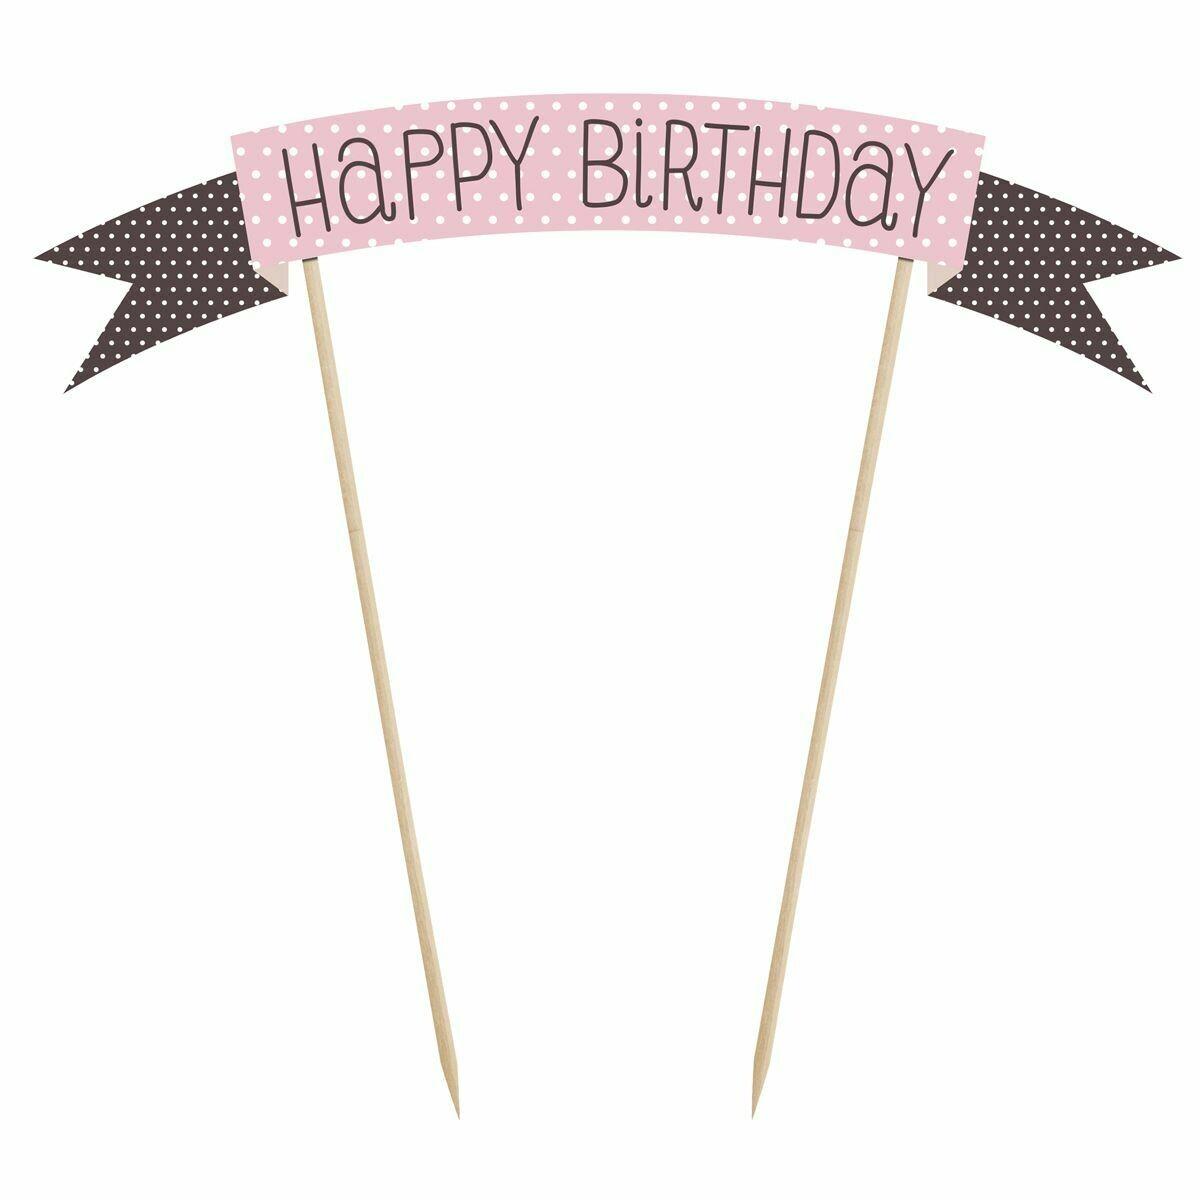 PartyDeco Cake Topper -Sweets -'Happy Birthday' -PINK & BLACK SPOTS Τόπερ Τούρτας 'Happy Birthday'